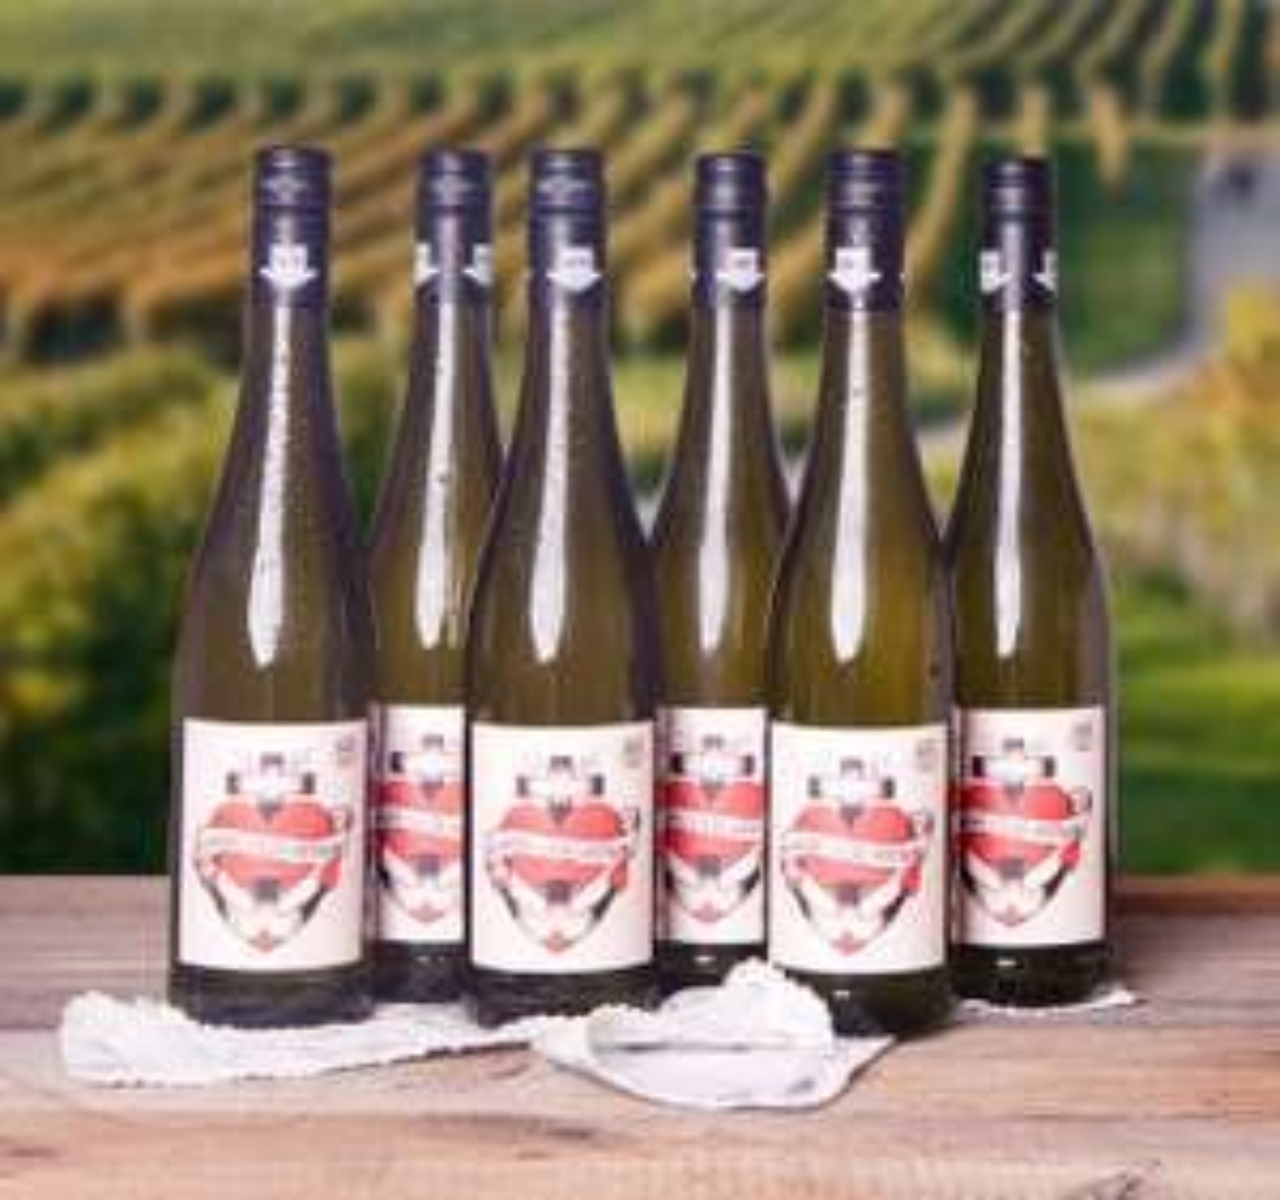 "12 Flaschen 2016er ""Glaube-Liebe-Hoffnung"" Riesling trocken / Pfalz /  Weingut Bergdolt-Reif & Nett für 4,98€ je Flasche [Foodist]"